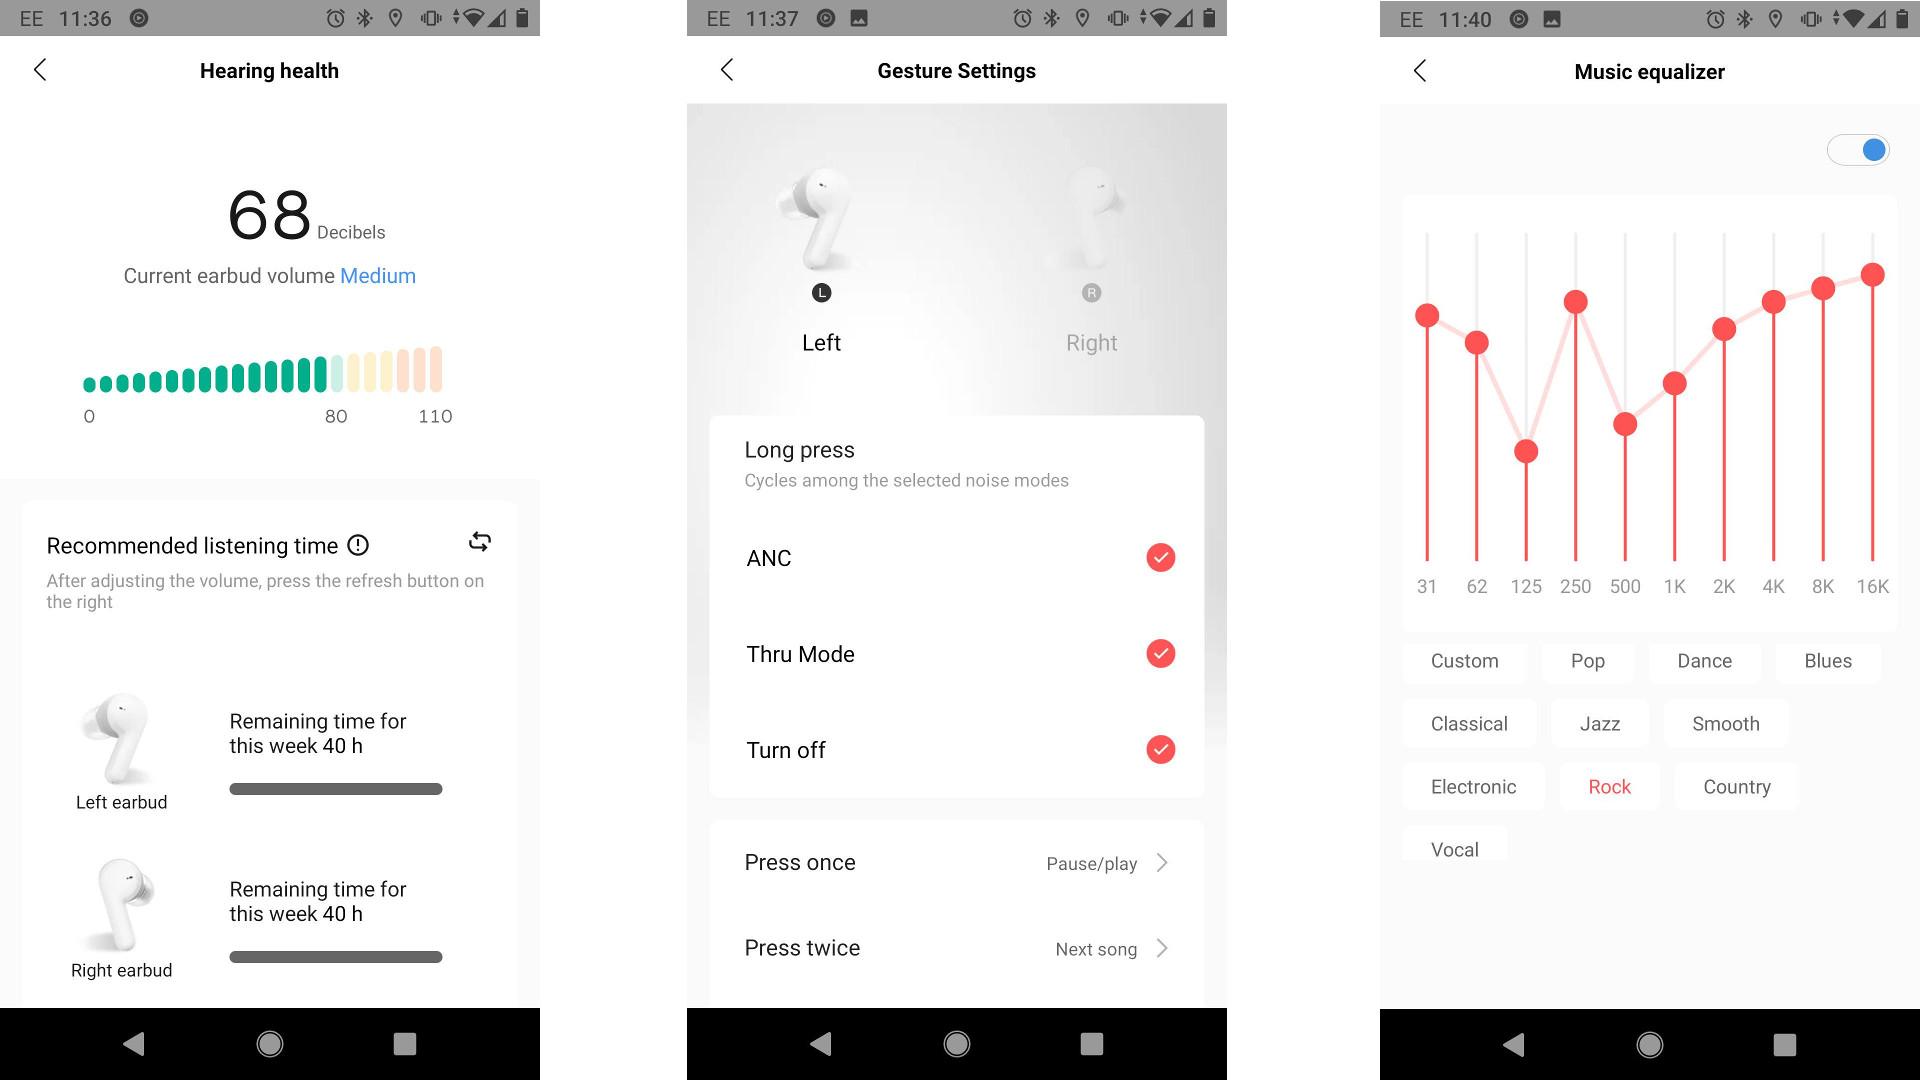 Amazfits Powerbuds Pro settings in the Zepp app